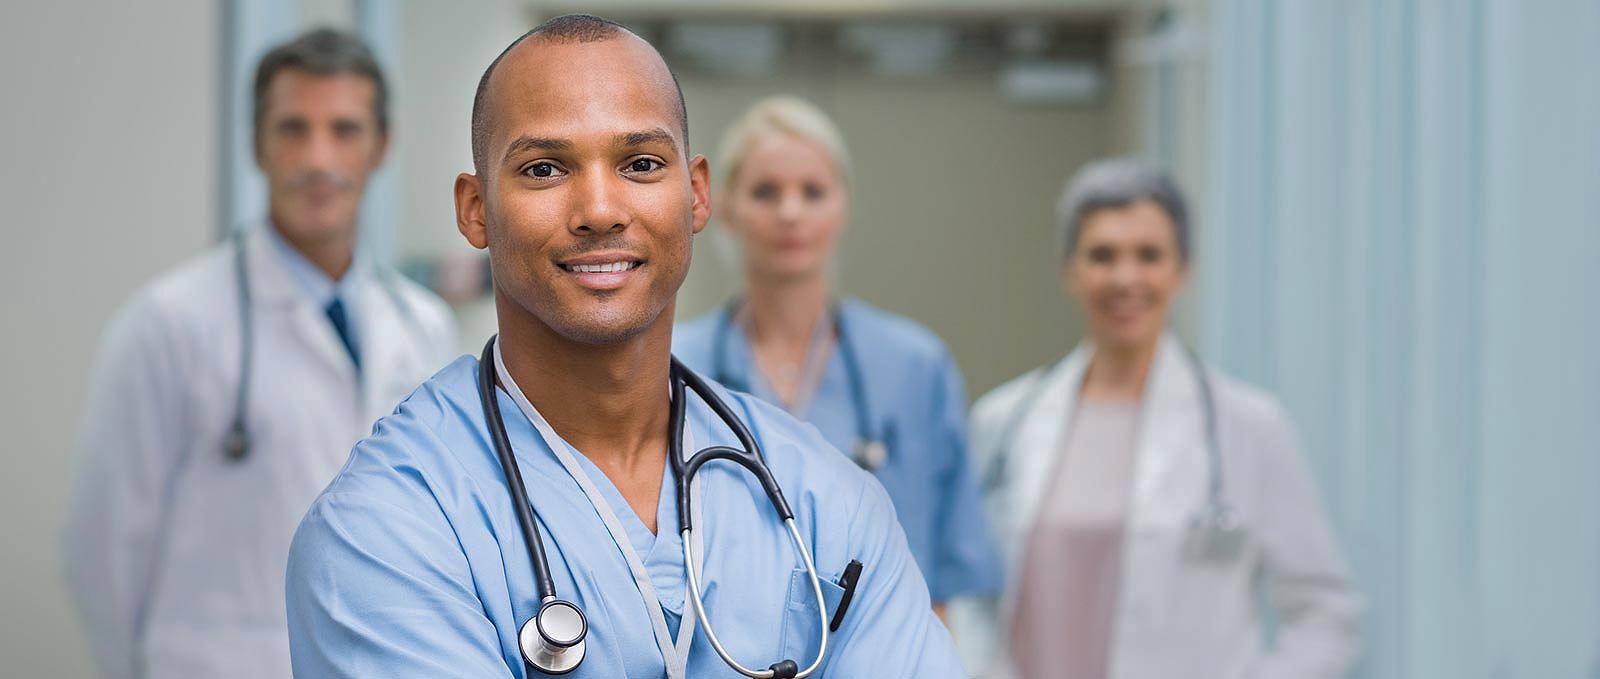 experienced male nurse in a hospital